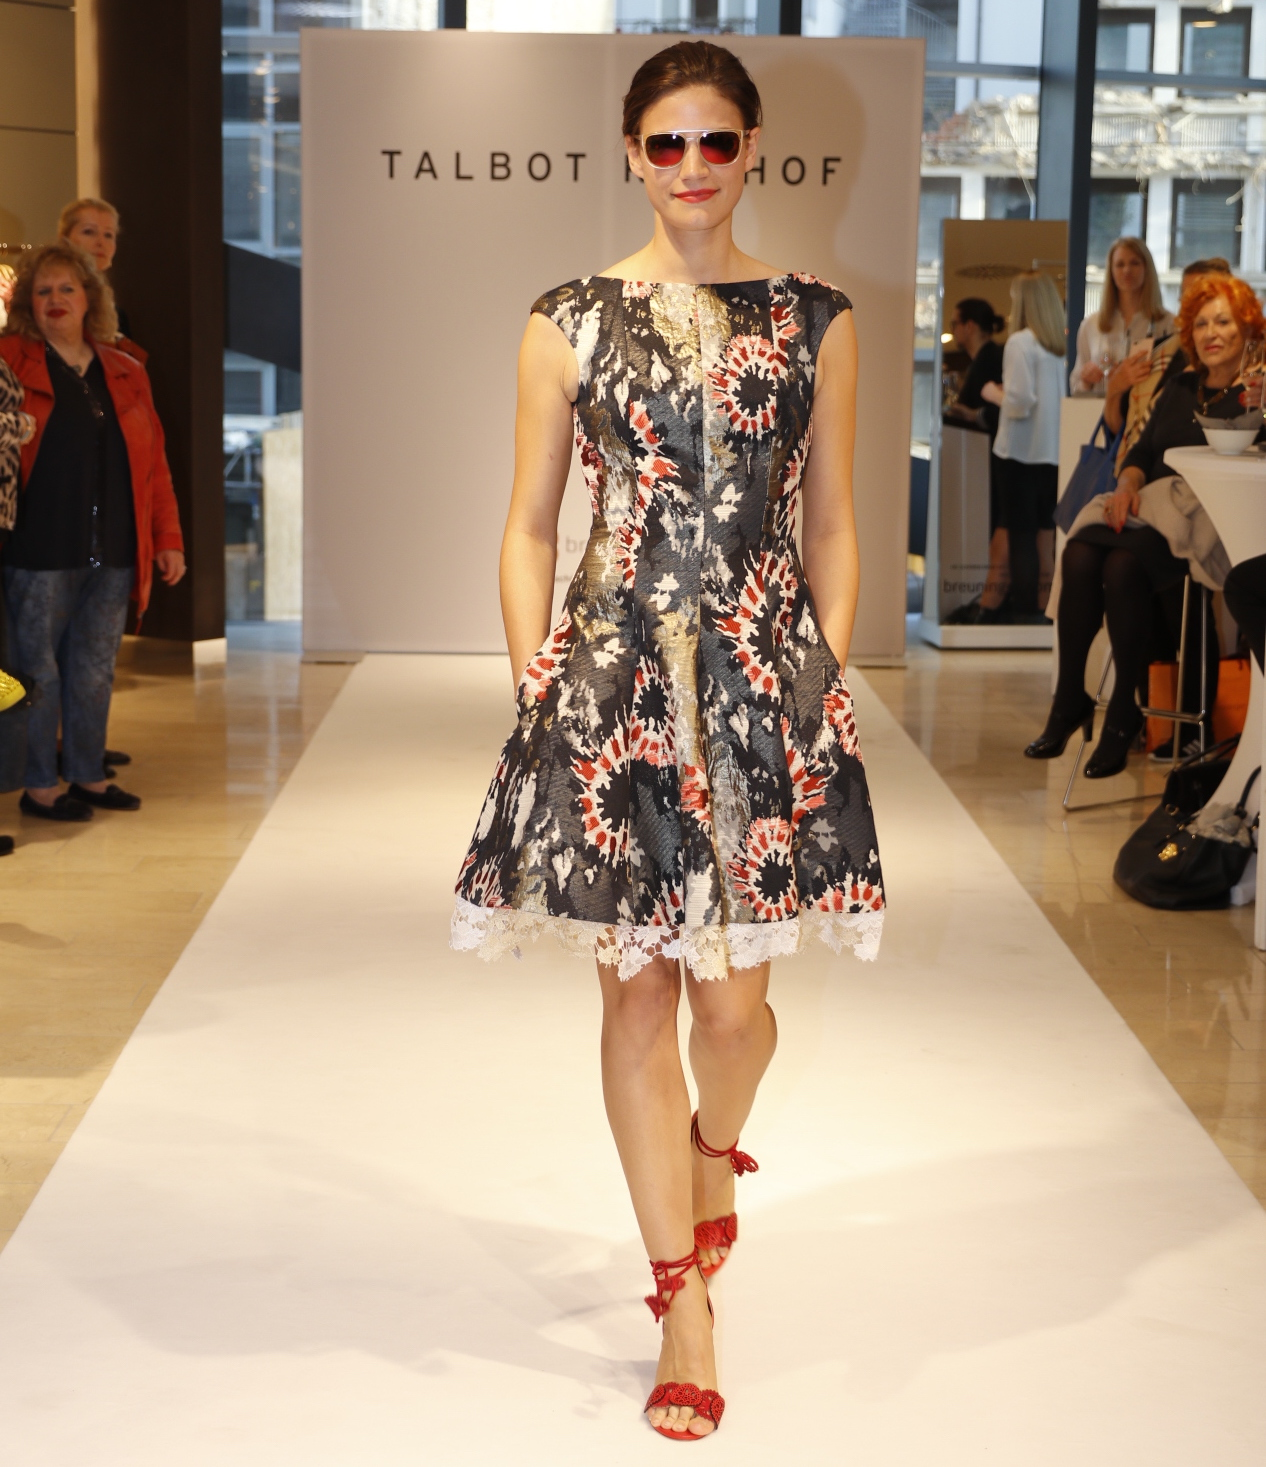 Talbot Runhof Kleid, Talbot Runhof Fashion Show, BreuningerDuesseldorf, Fashion-Blog, Lieblingsstil.com